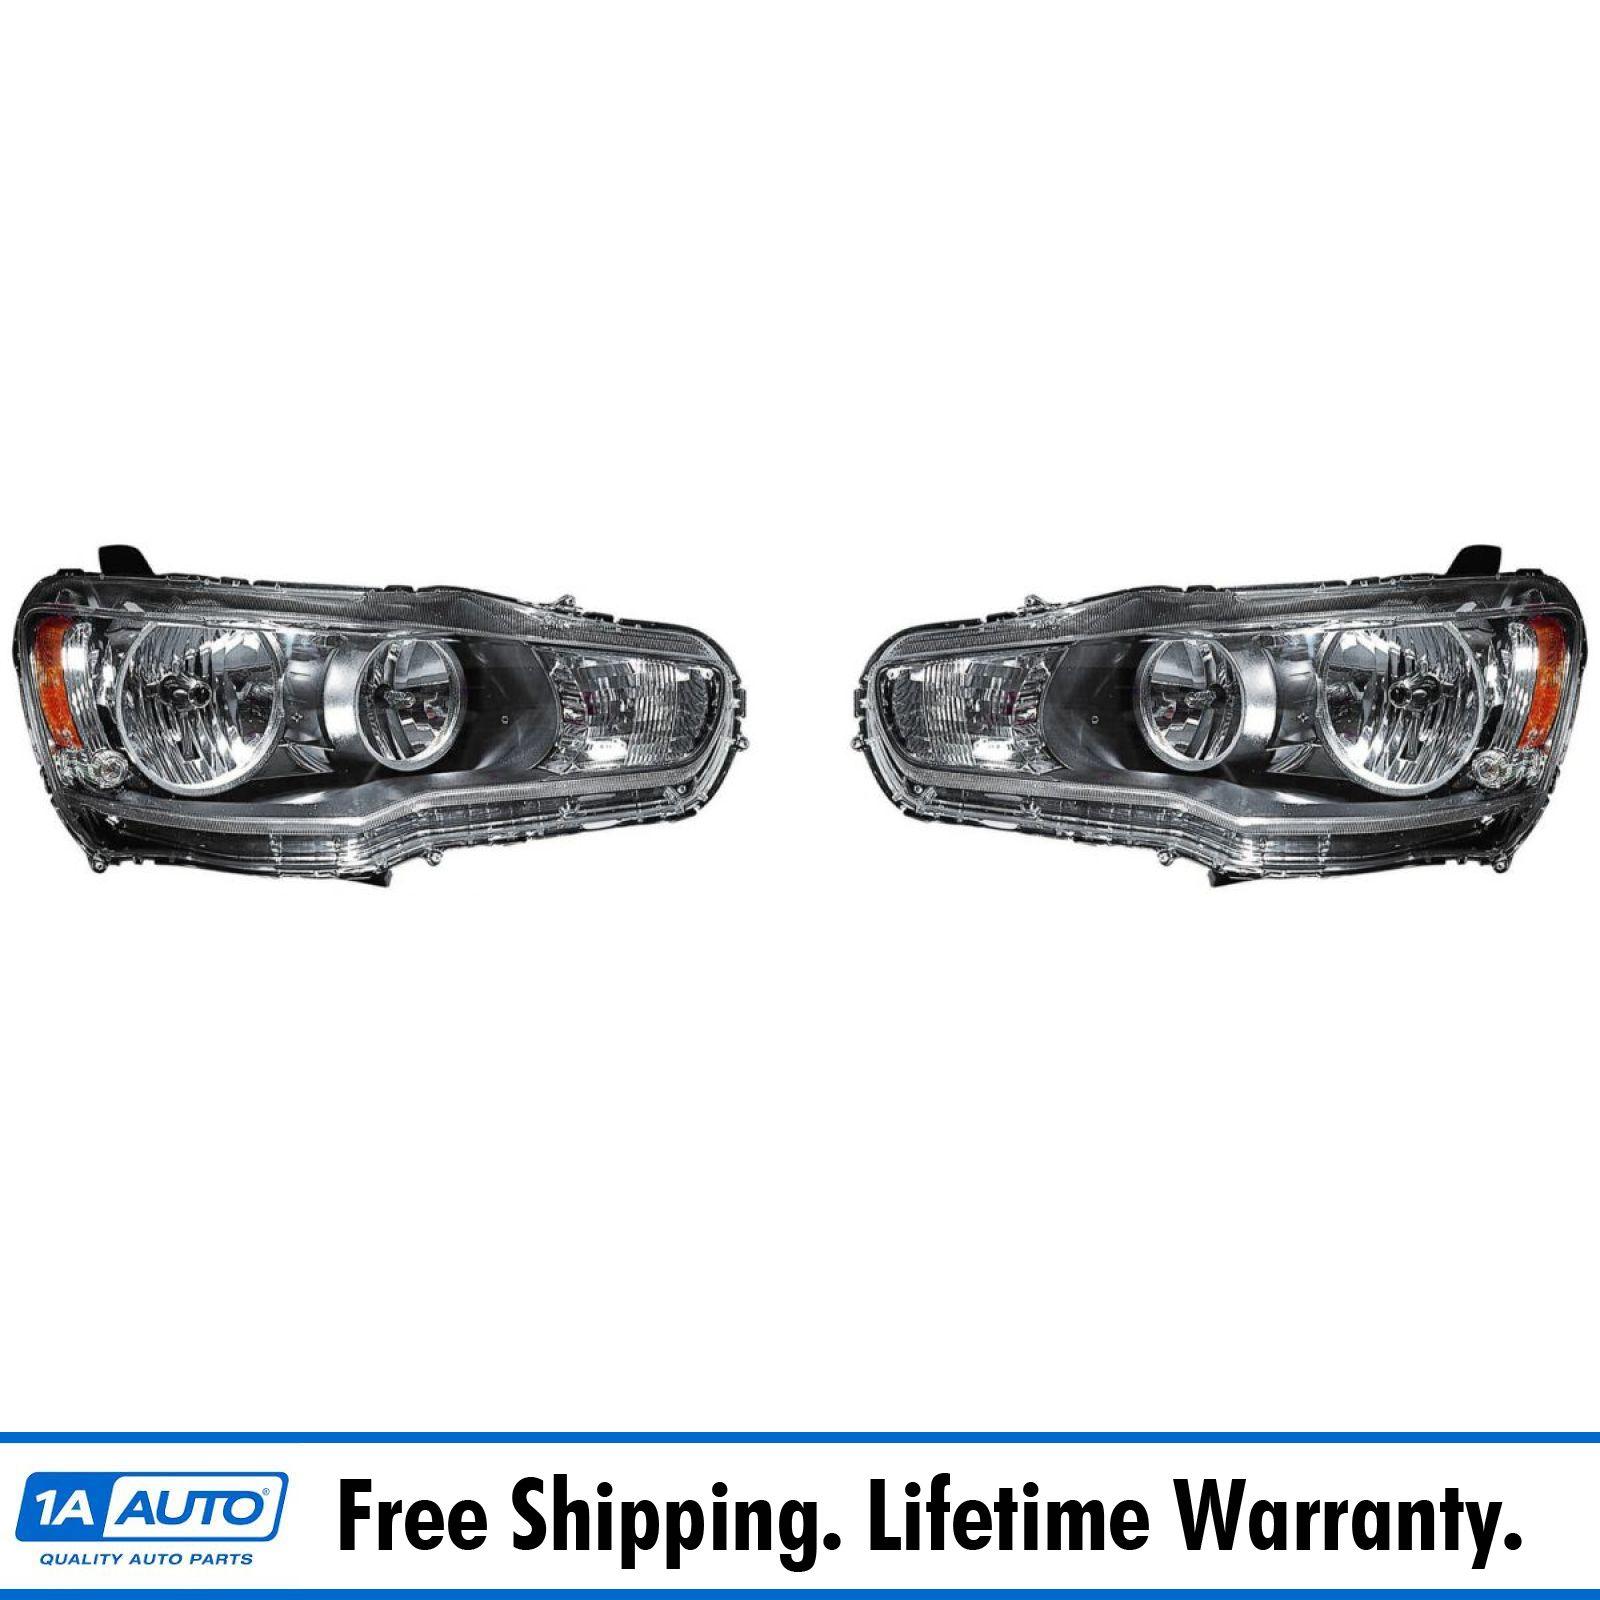 for 2008-2015 Mitsubishi Lancer Halogen Ver. Pair Halo Projector Headlights